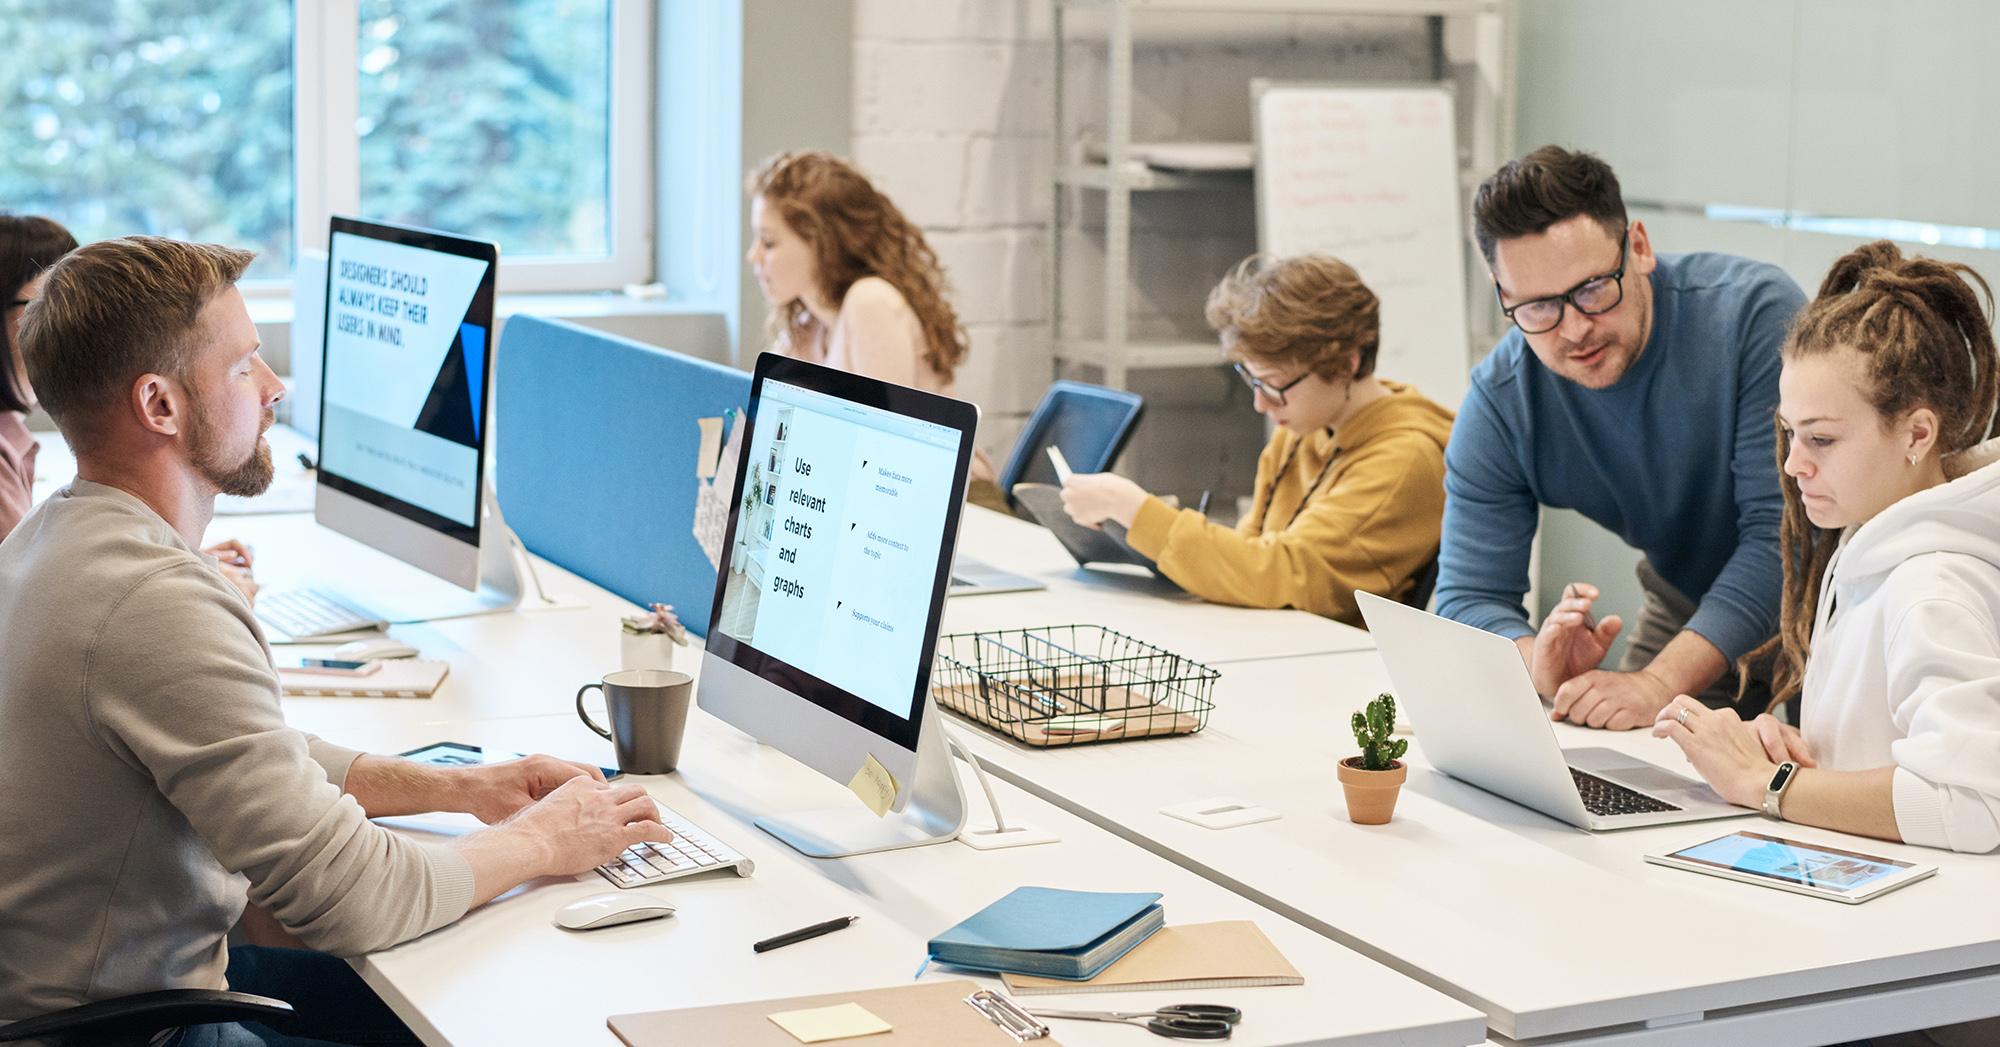 Arbeitsumfeld verschiedene Personen am PC